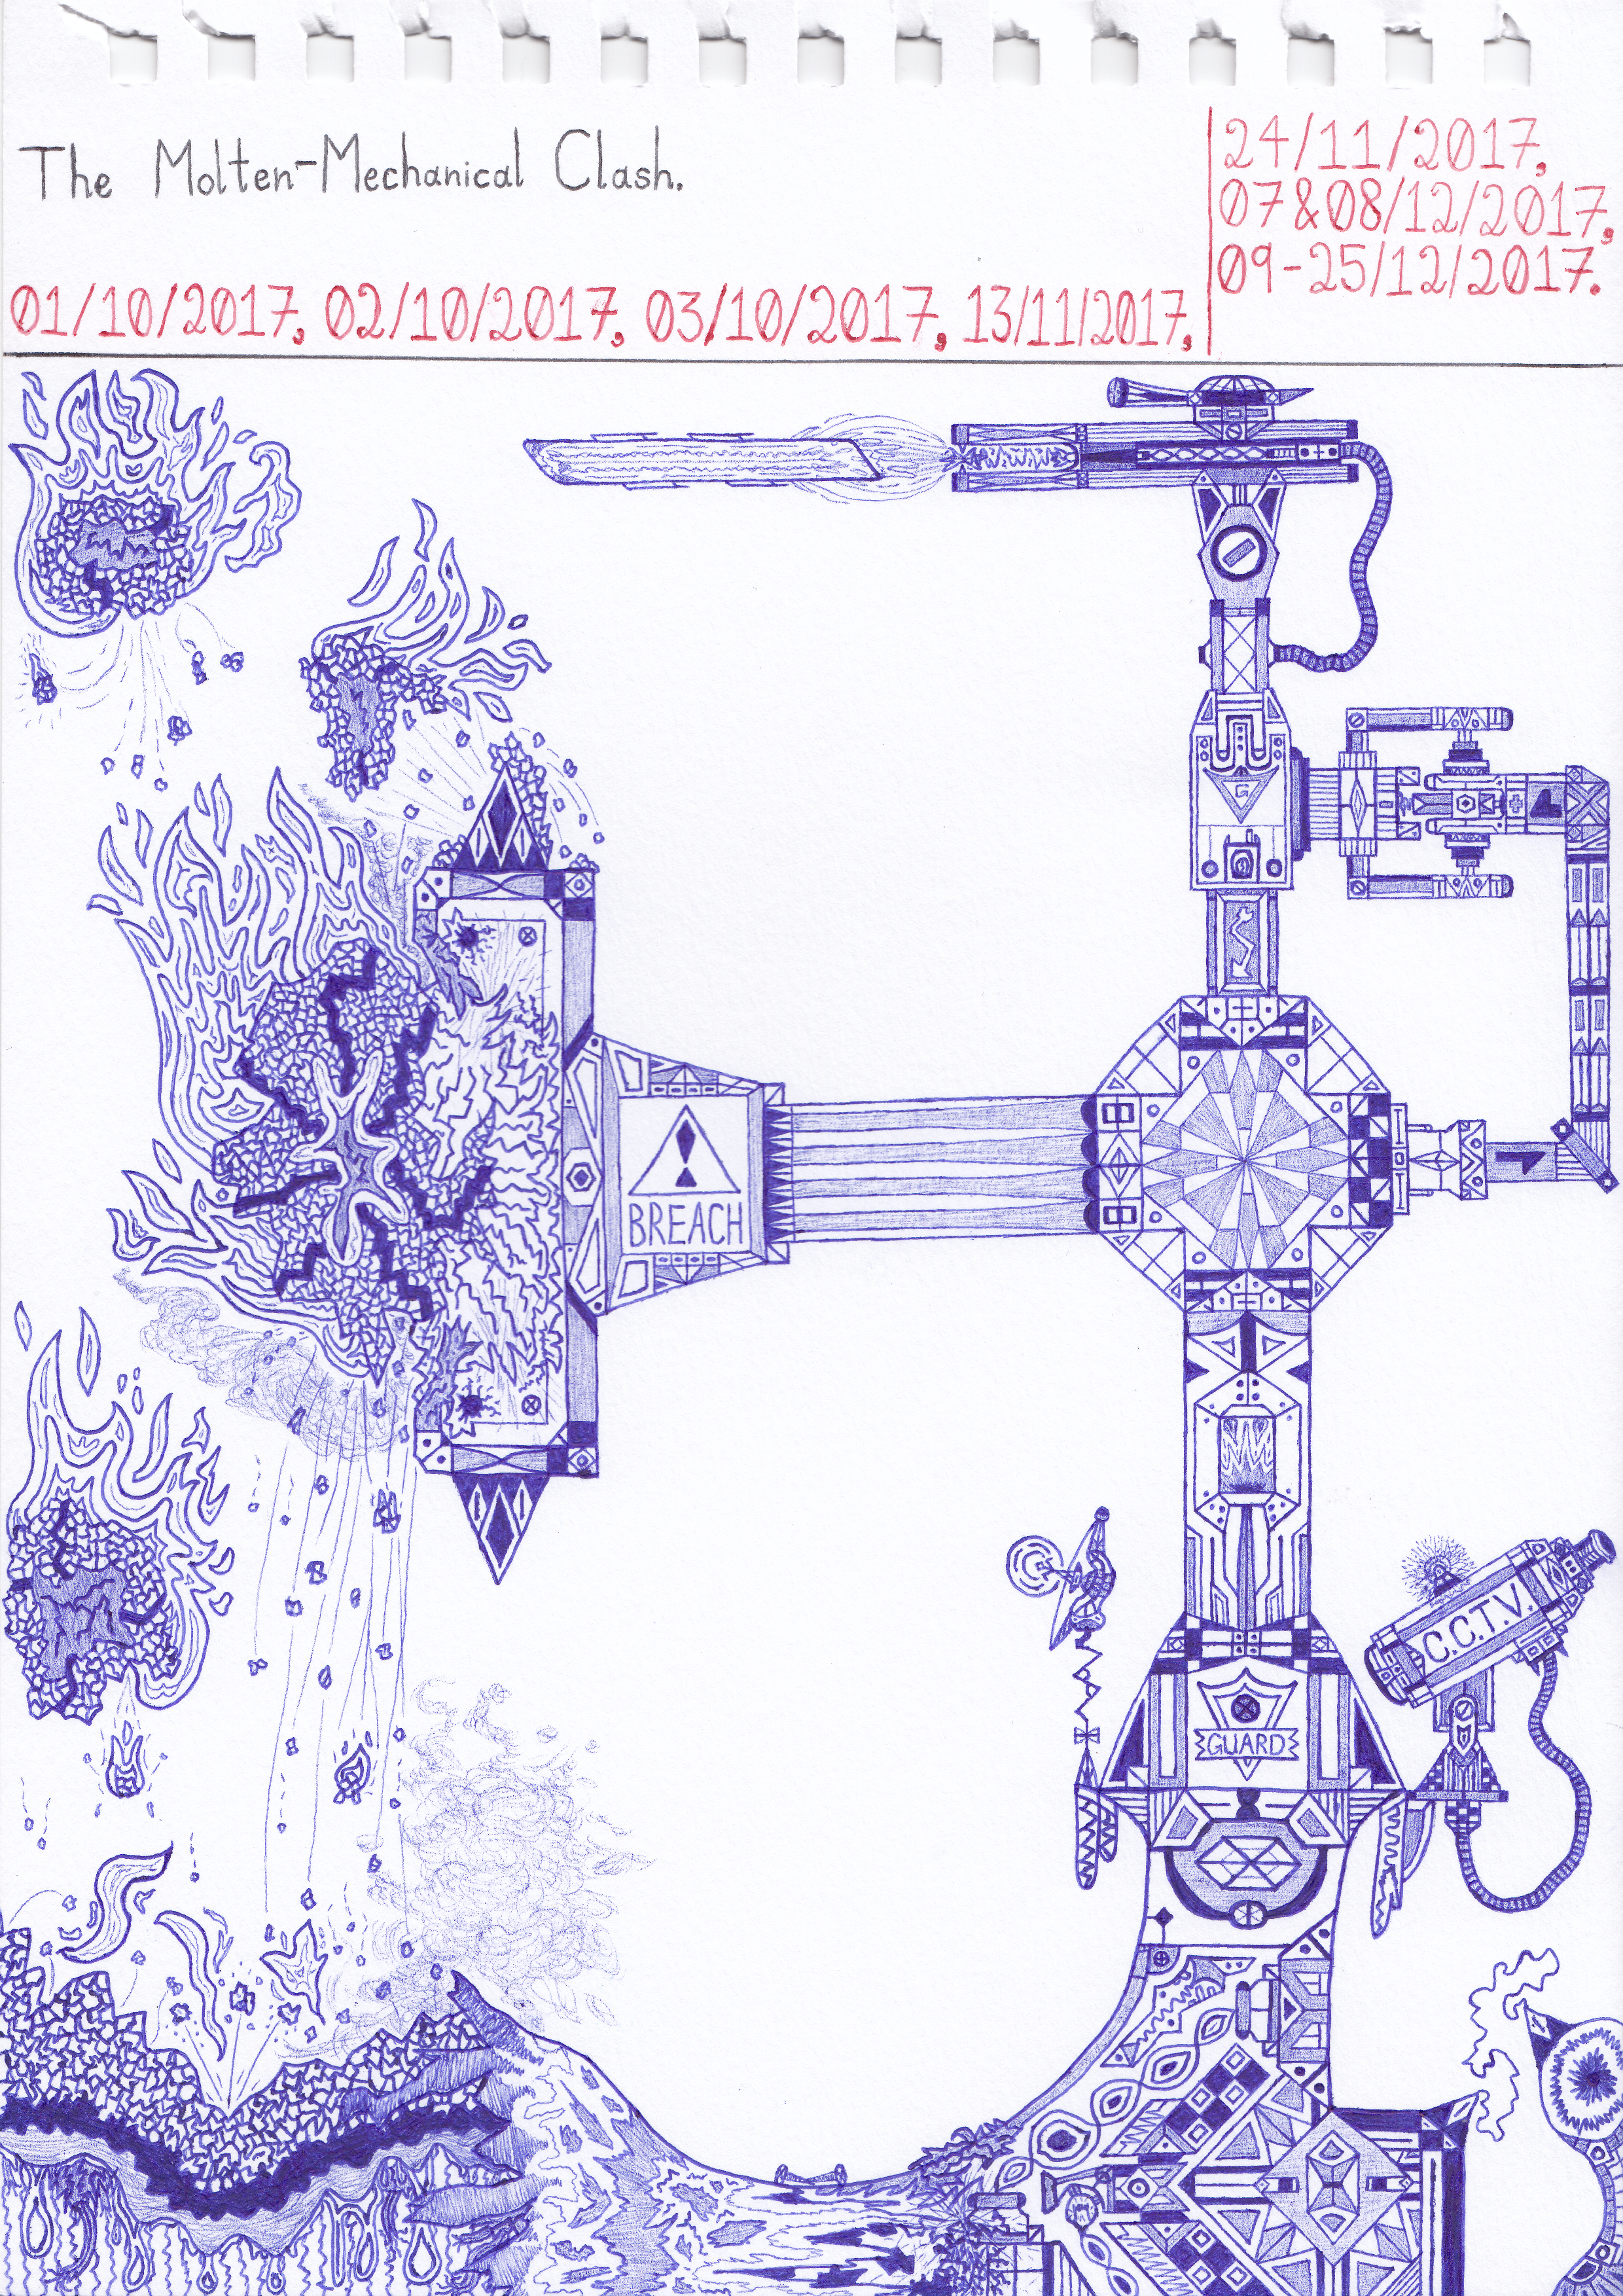 The Molten-Mechanical Clash.